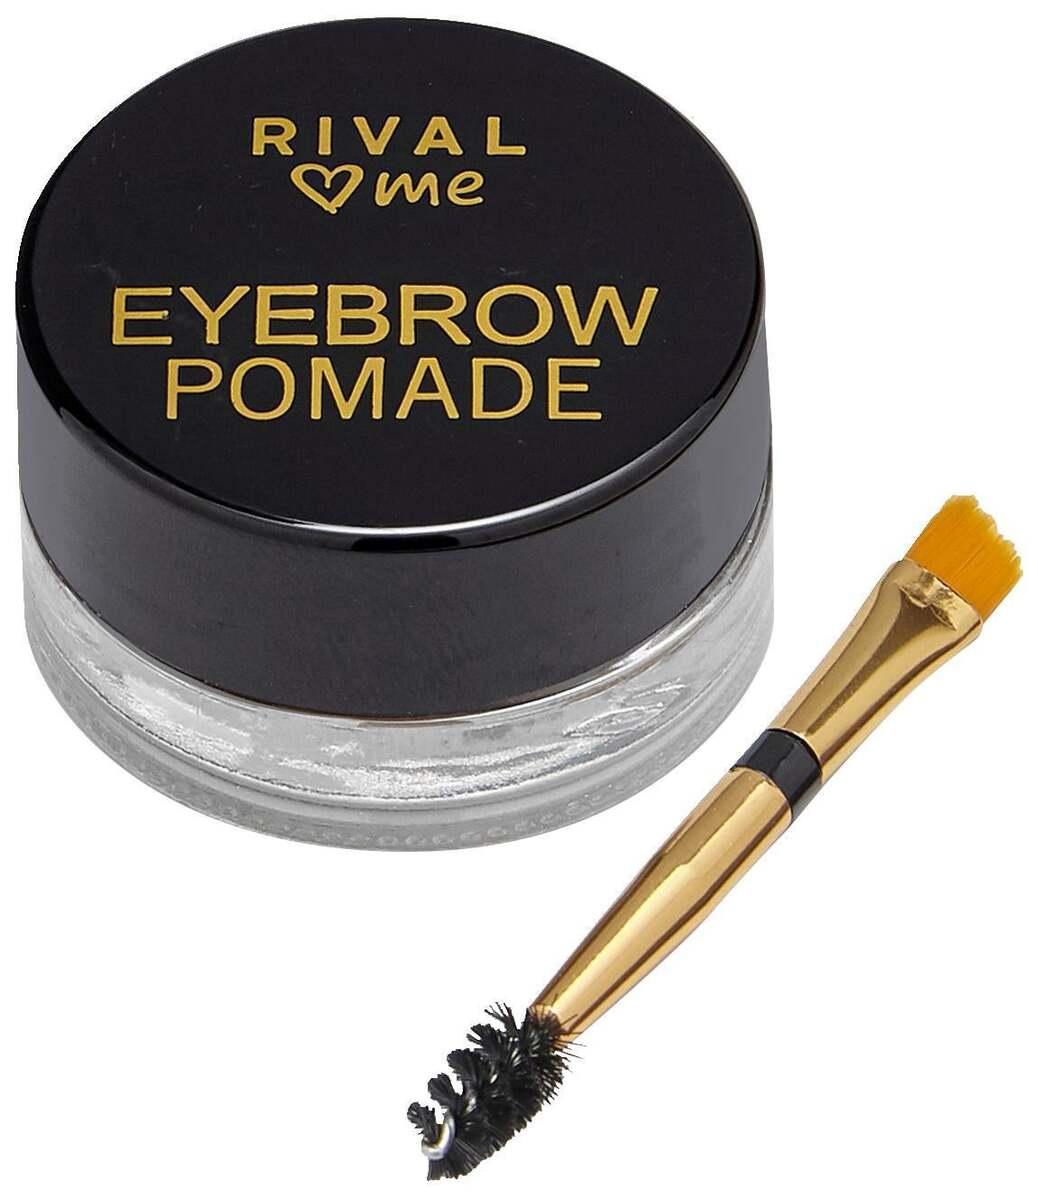 Bild 2 von RIVAL loves me Eyebrow Pomade 03 soft brown